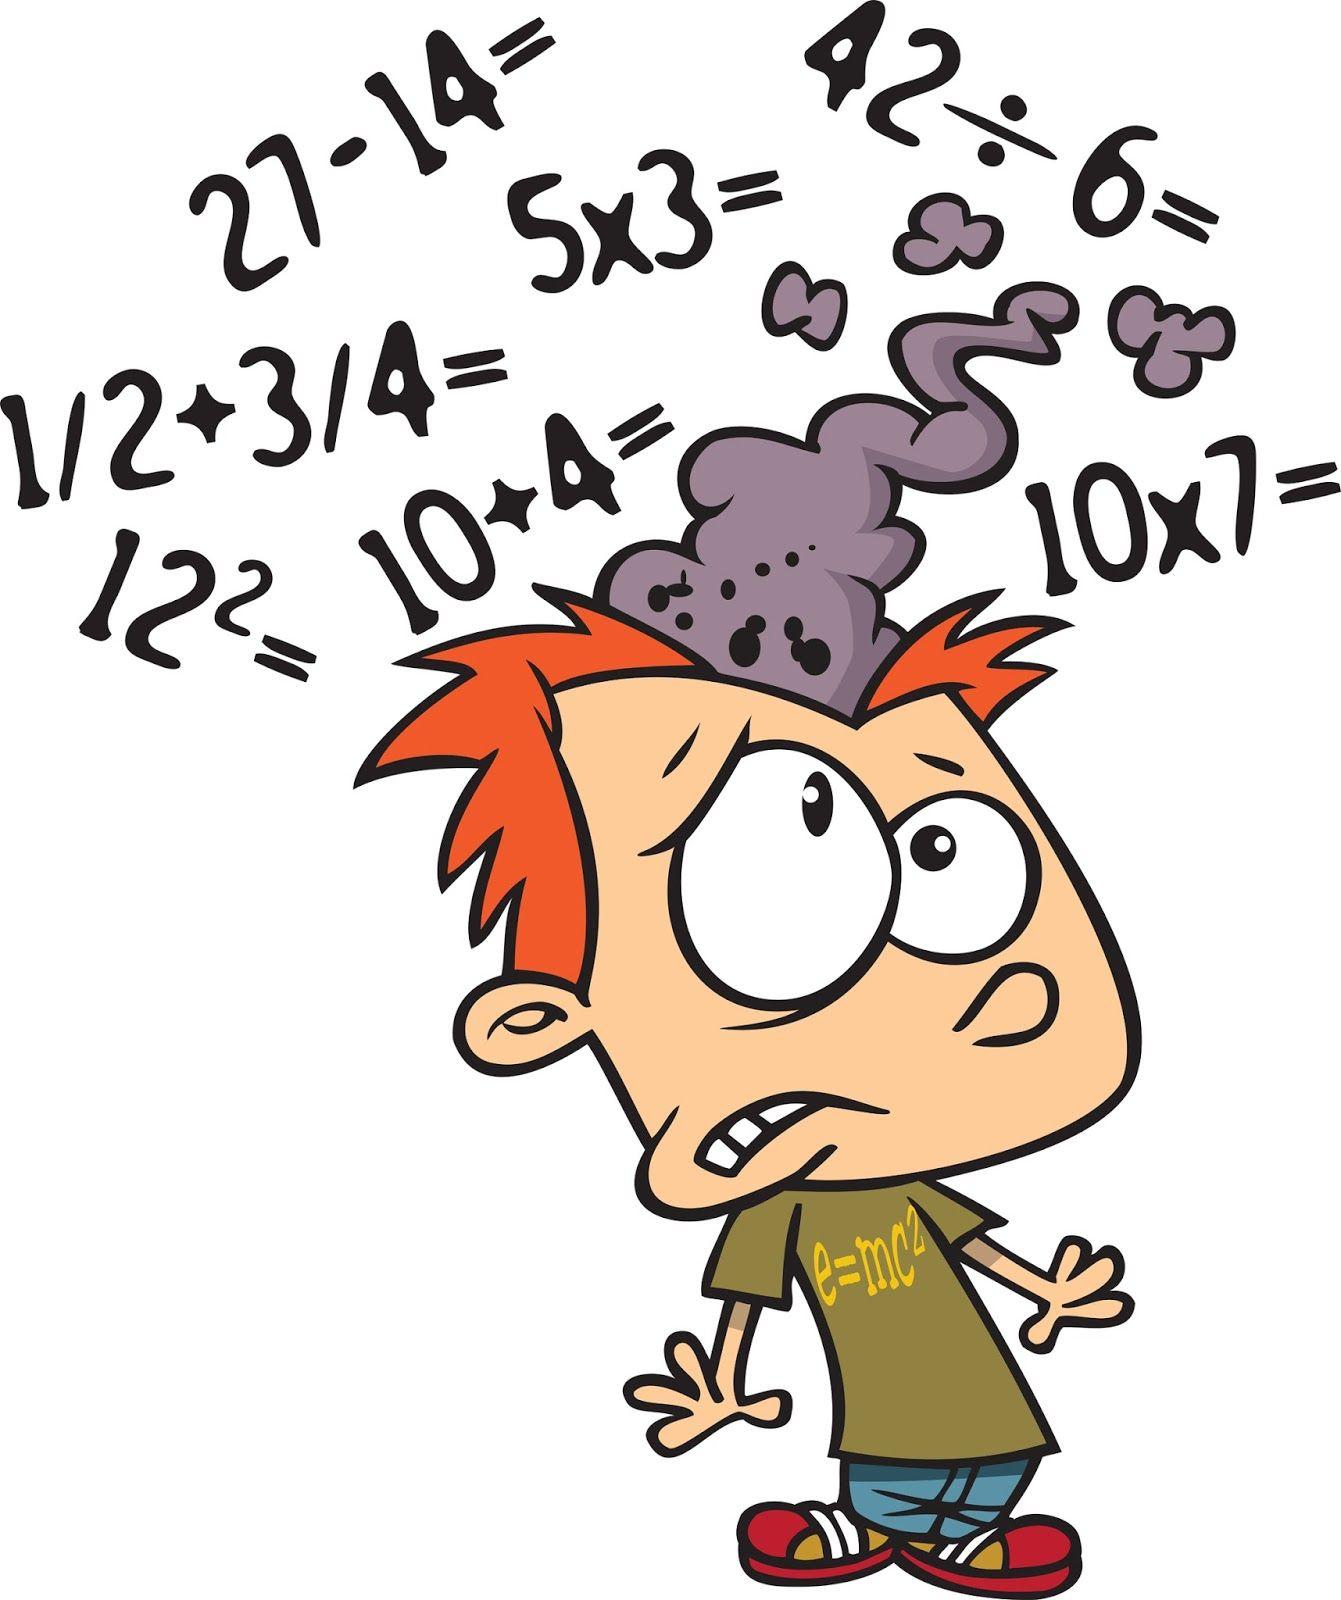 6a9fbc9545fe4d6642c1839ce85ff75d Sure Way Maths on 3rd grade,